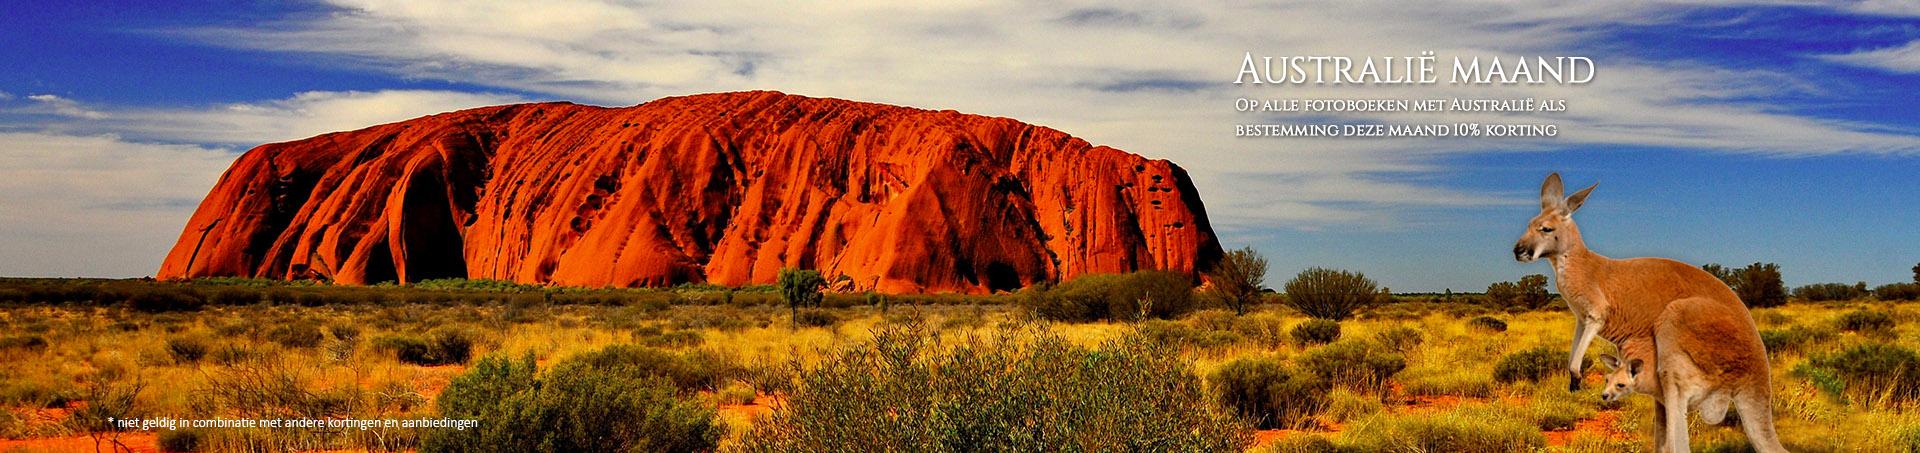 Australie maand